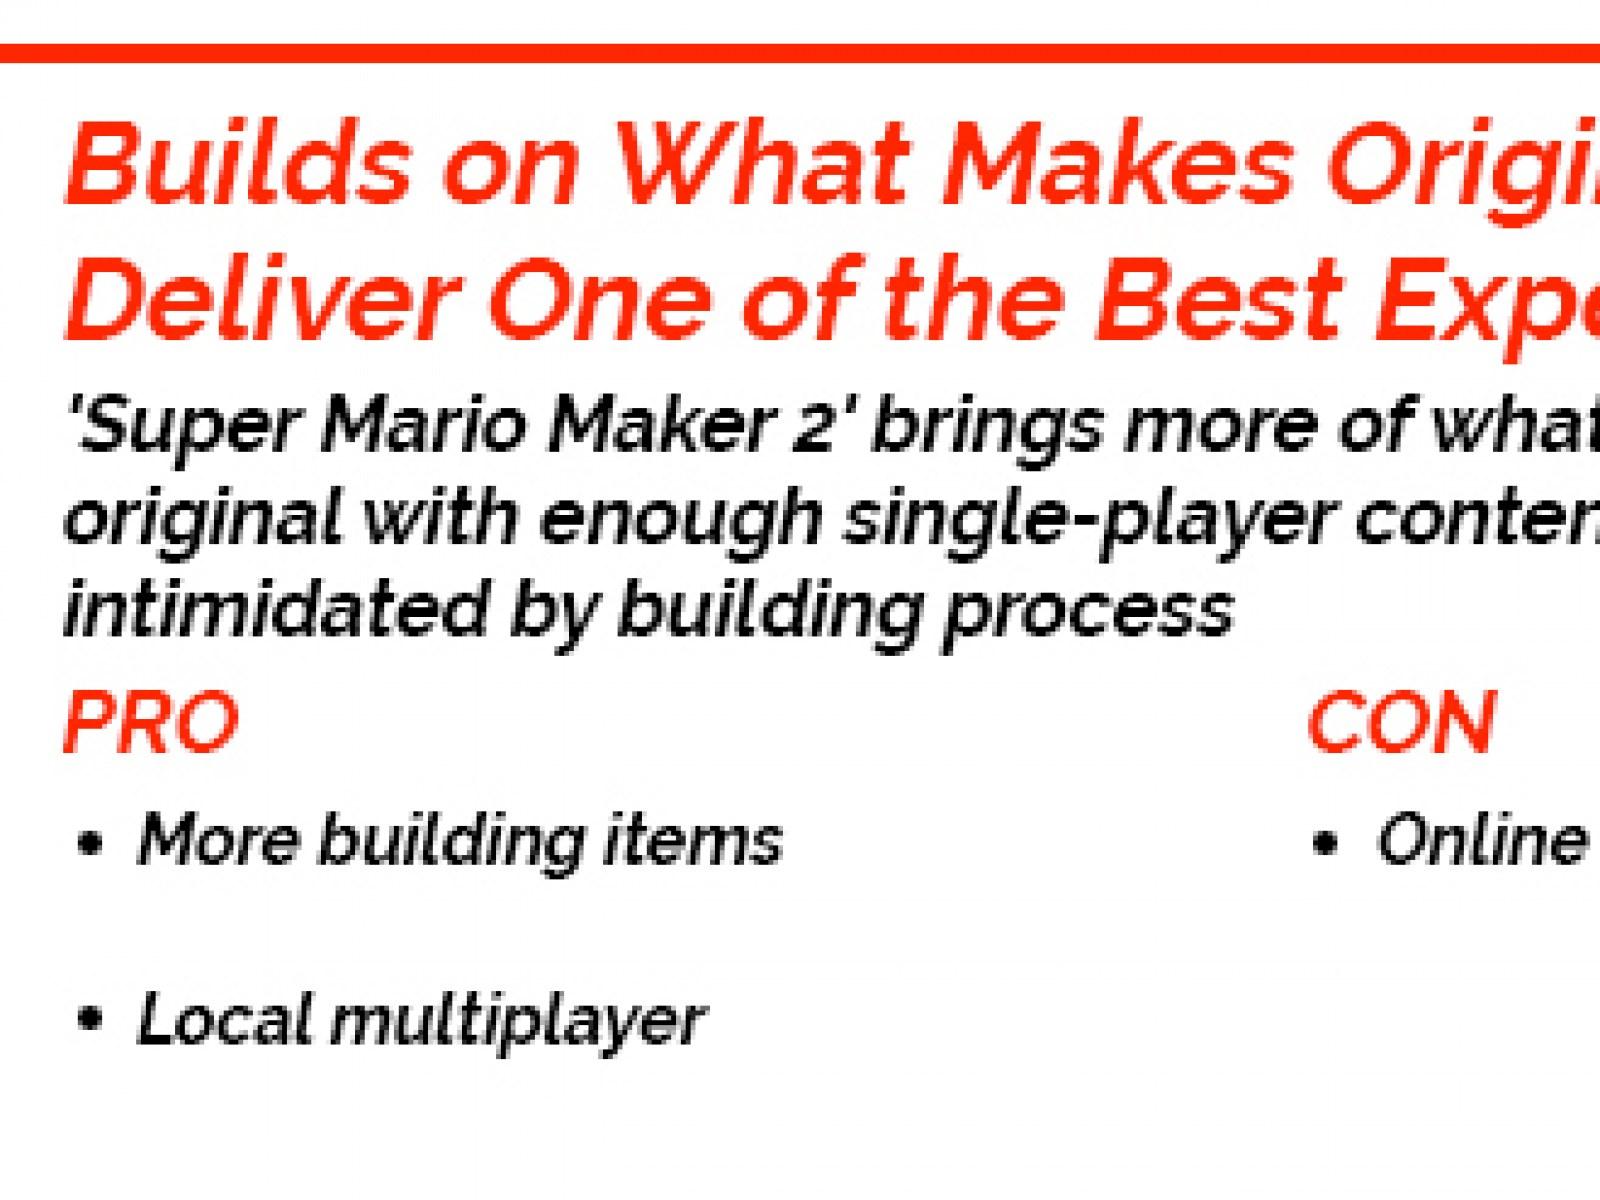 Super Mario Maker 2' Review: Builds on What Makes Original